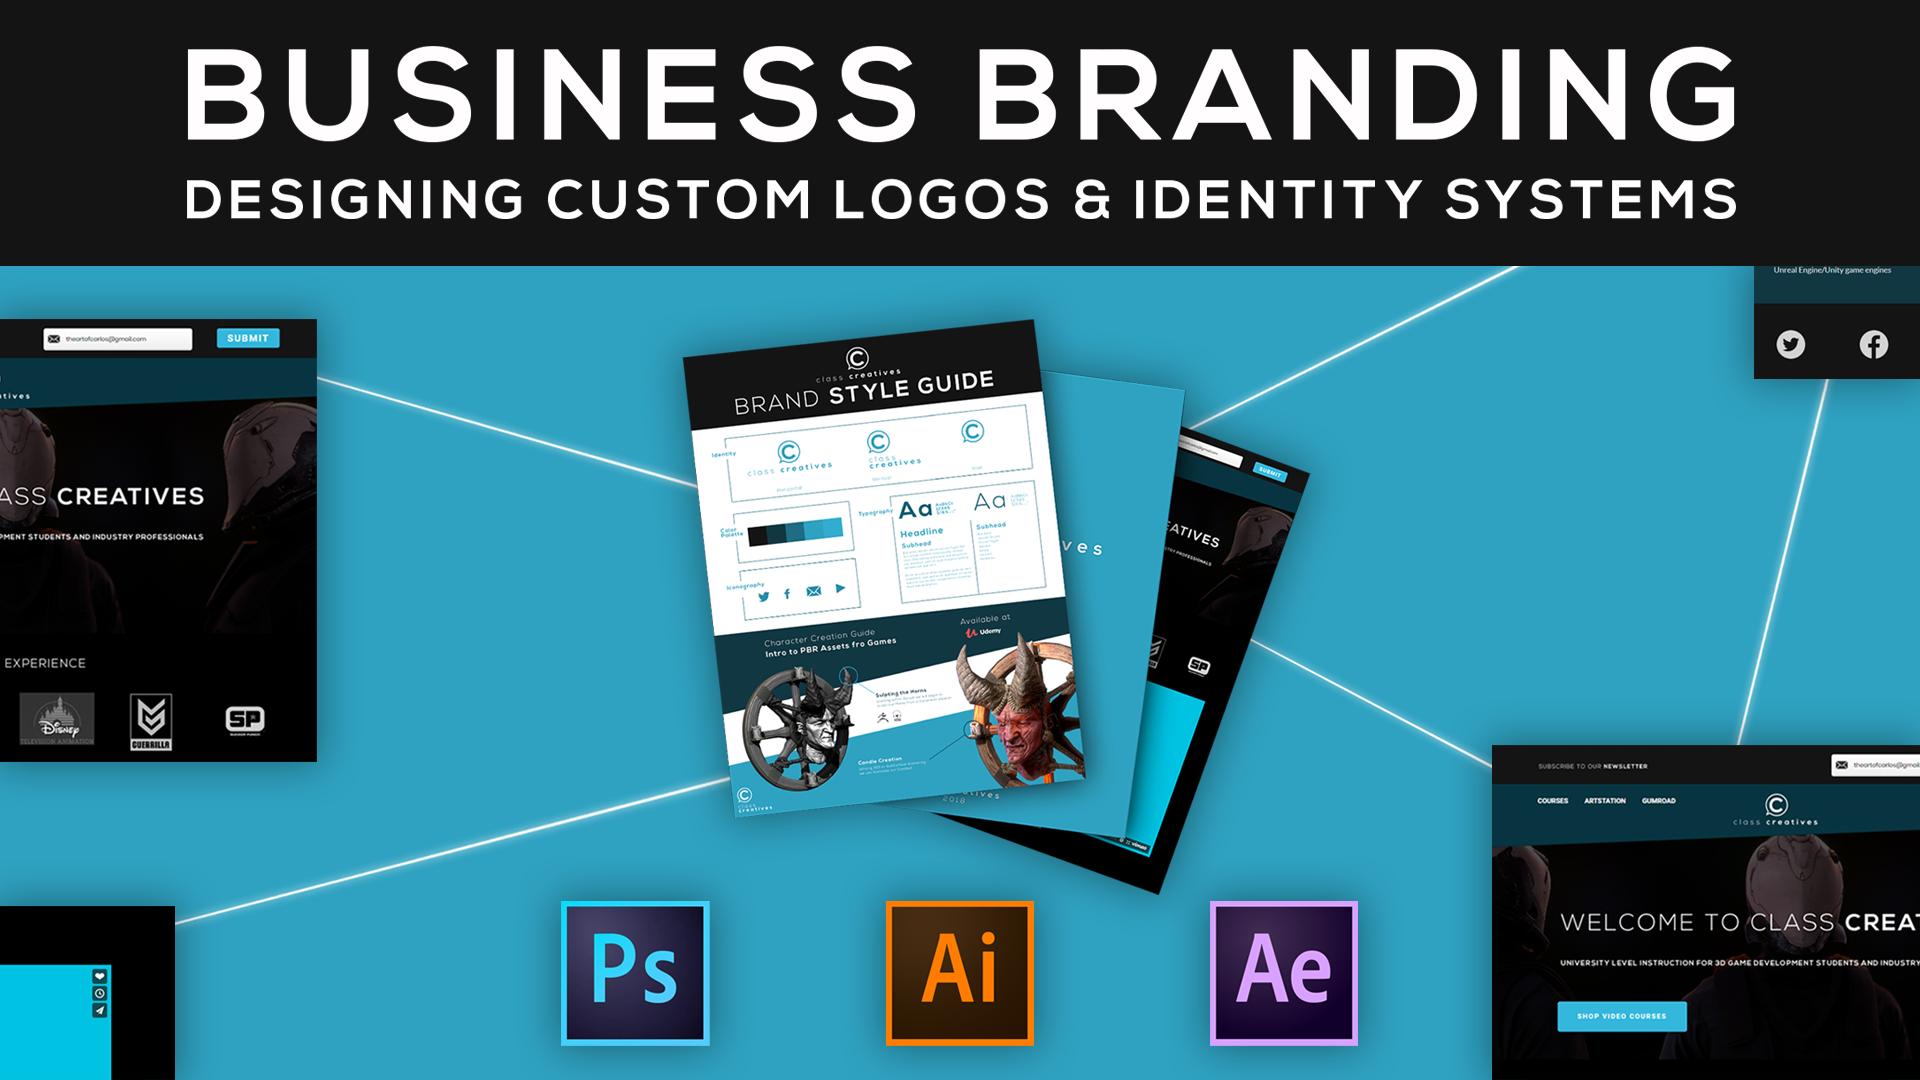 Business Branding: Designing Custom Logos & Identity Systems